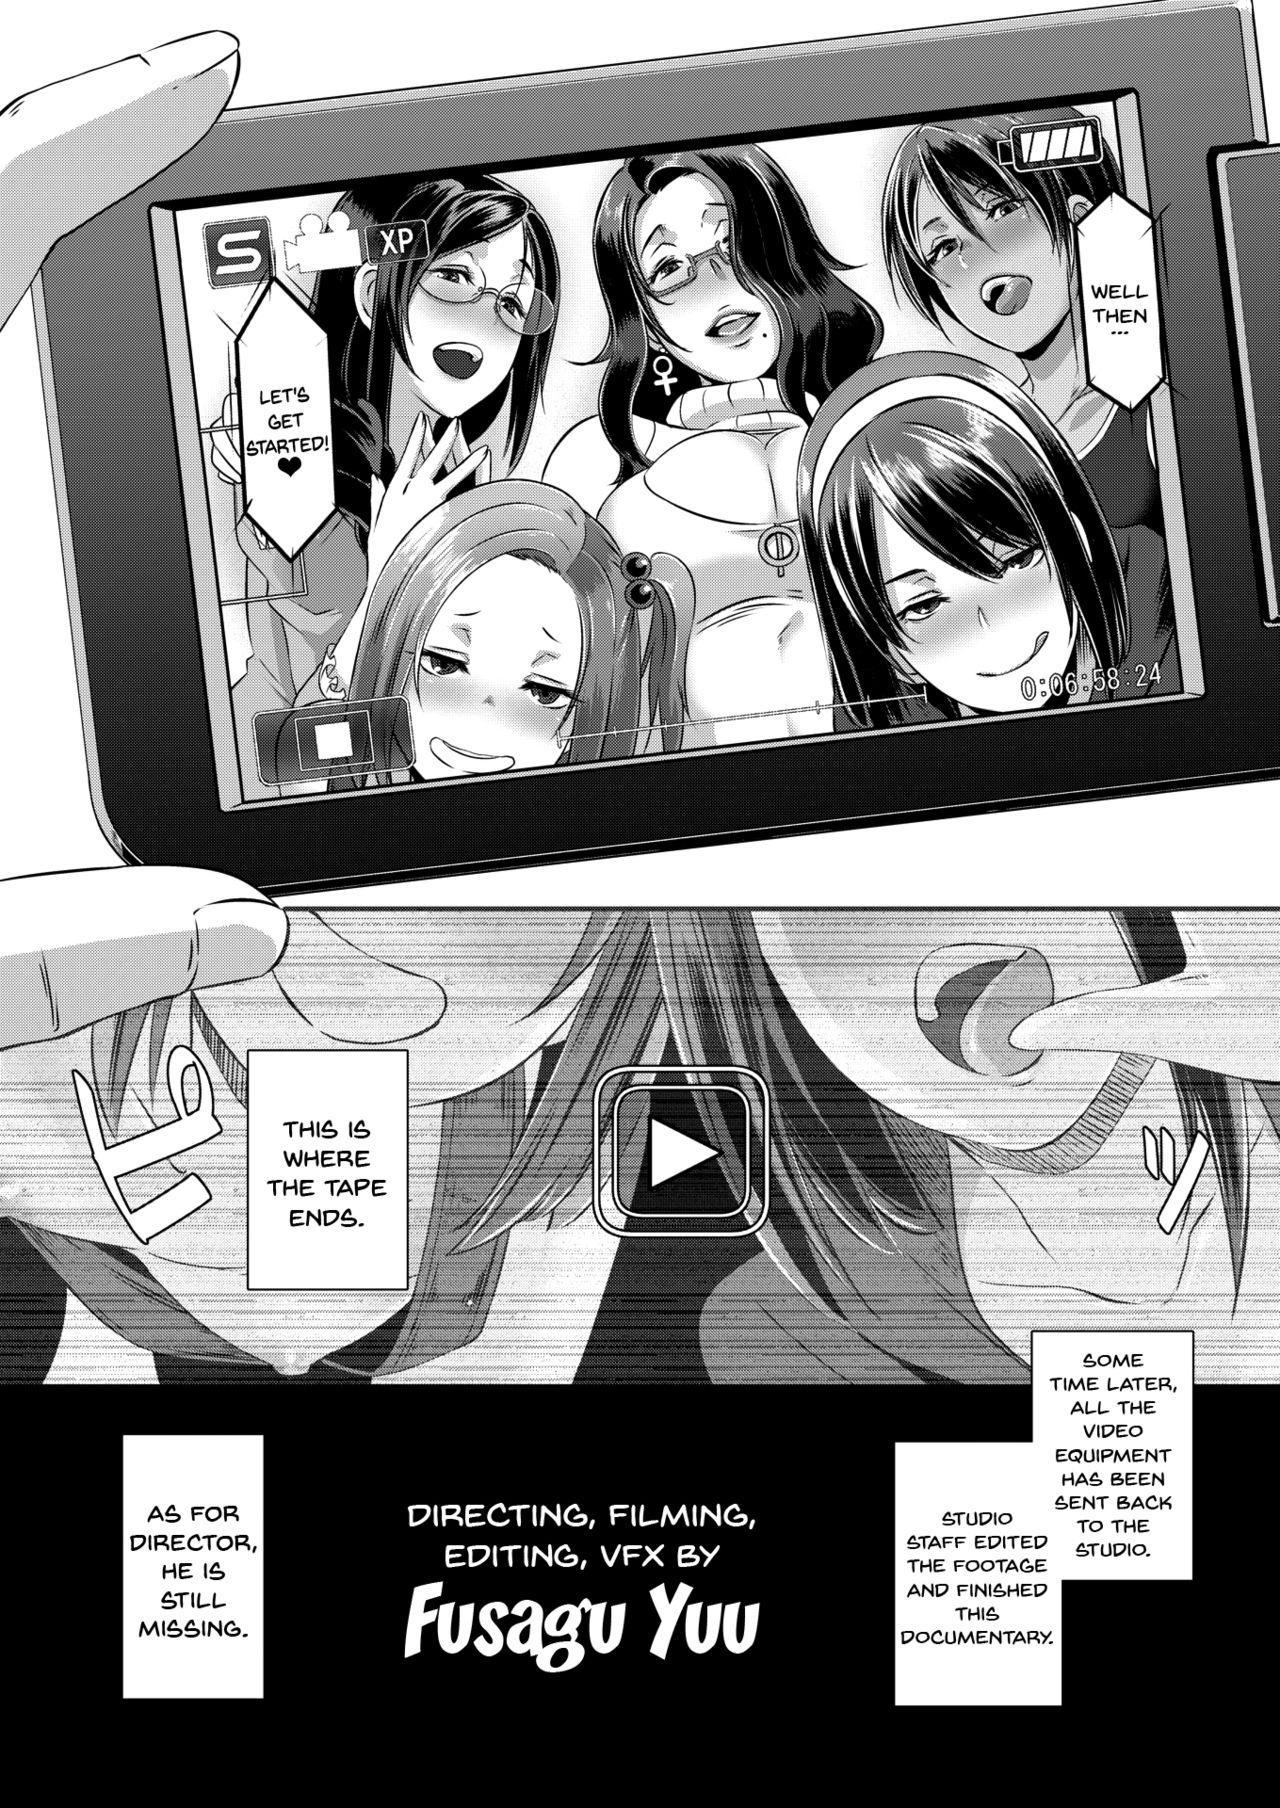 [Butcha-U] SDPO ~Seimukan no Susume~ | SDPO ~Sexual Desire Processing Officer~ (COMIC Megastore Alpha 2017-09) [English] [Doujins.com] [Digital] 19